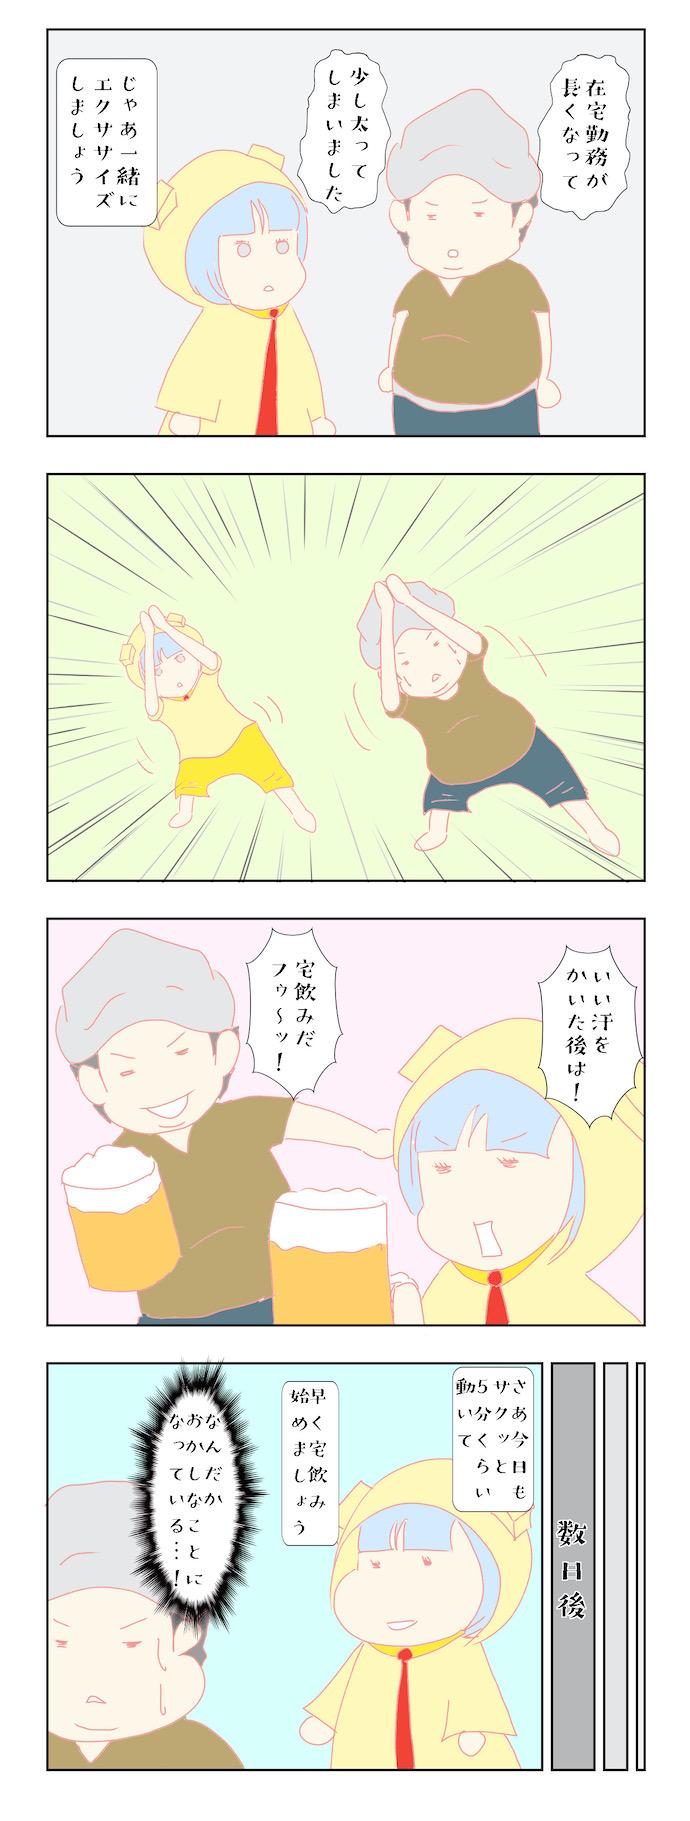 kimura_2005_01